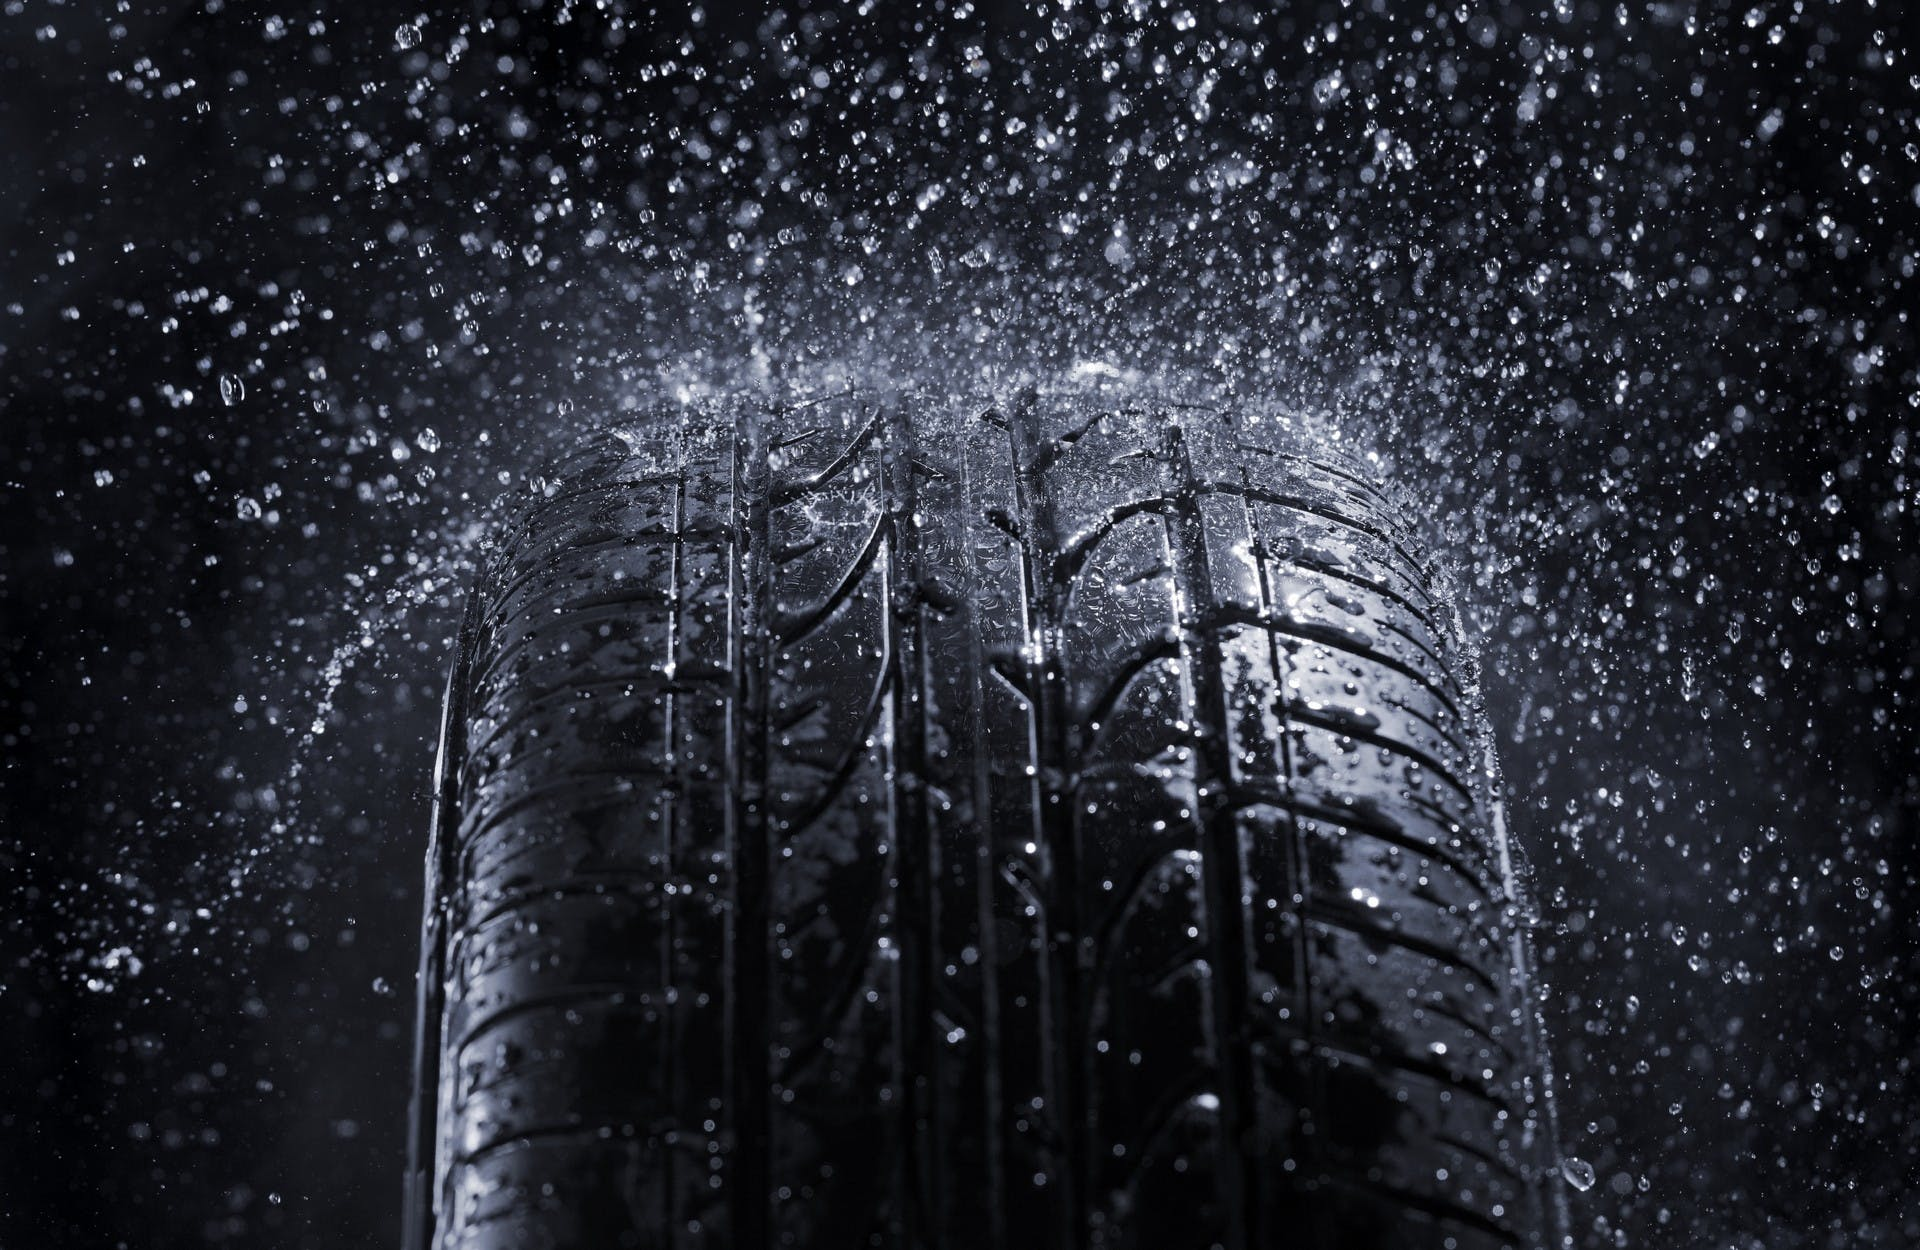 Car tire in rain